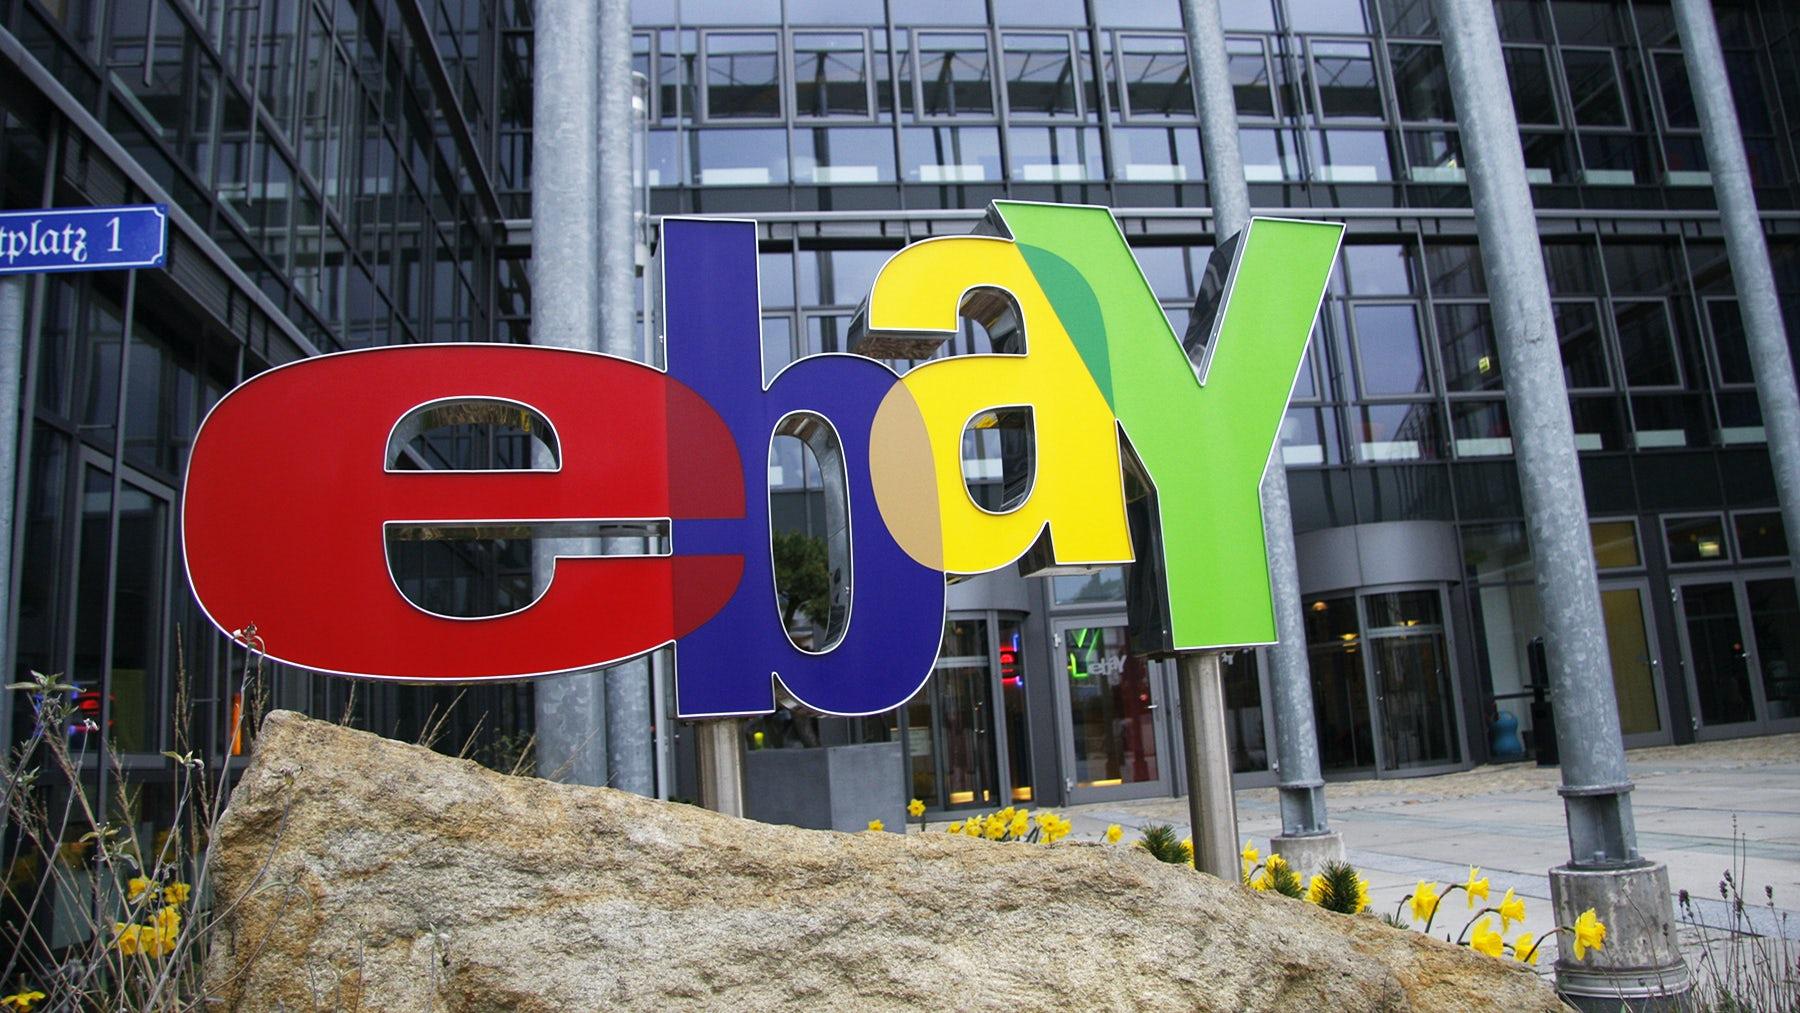 eBay headquarters in San Jose | Source: Shutterstock